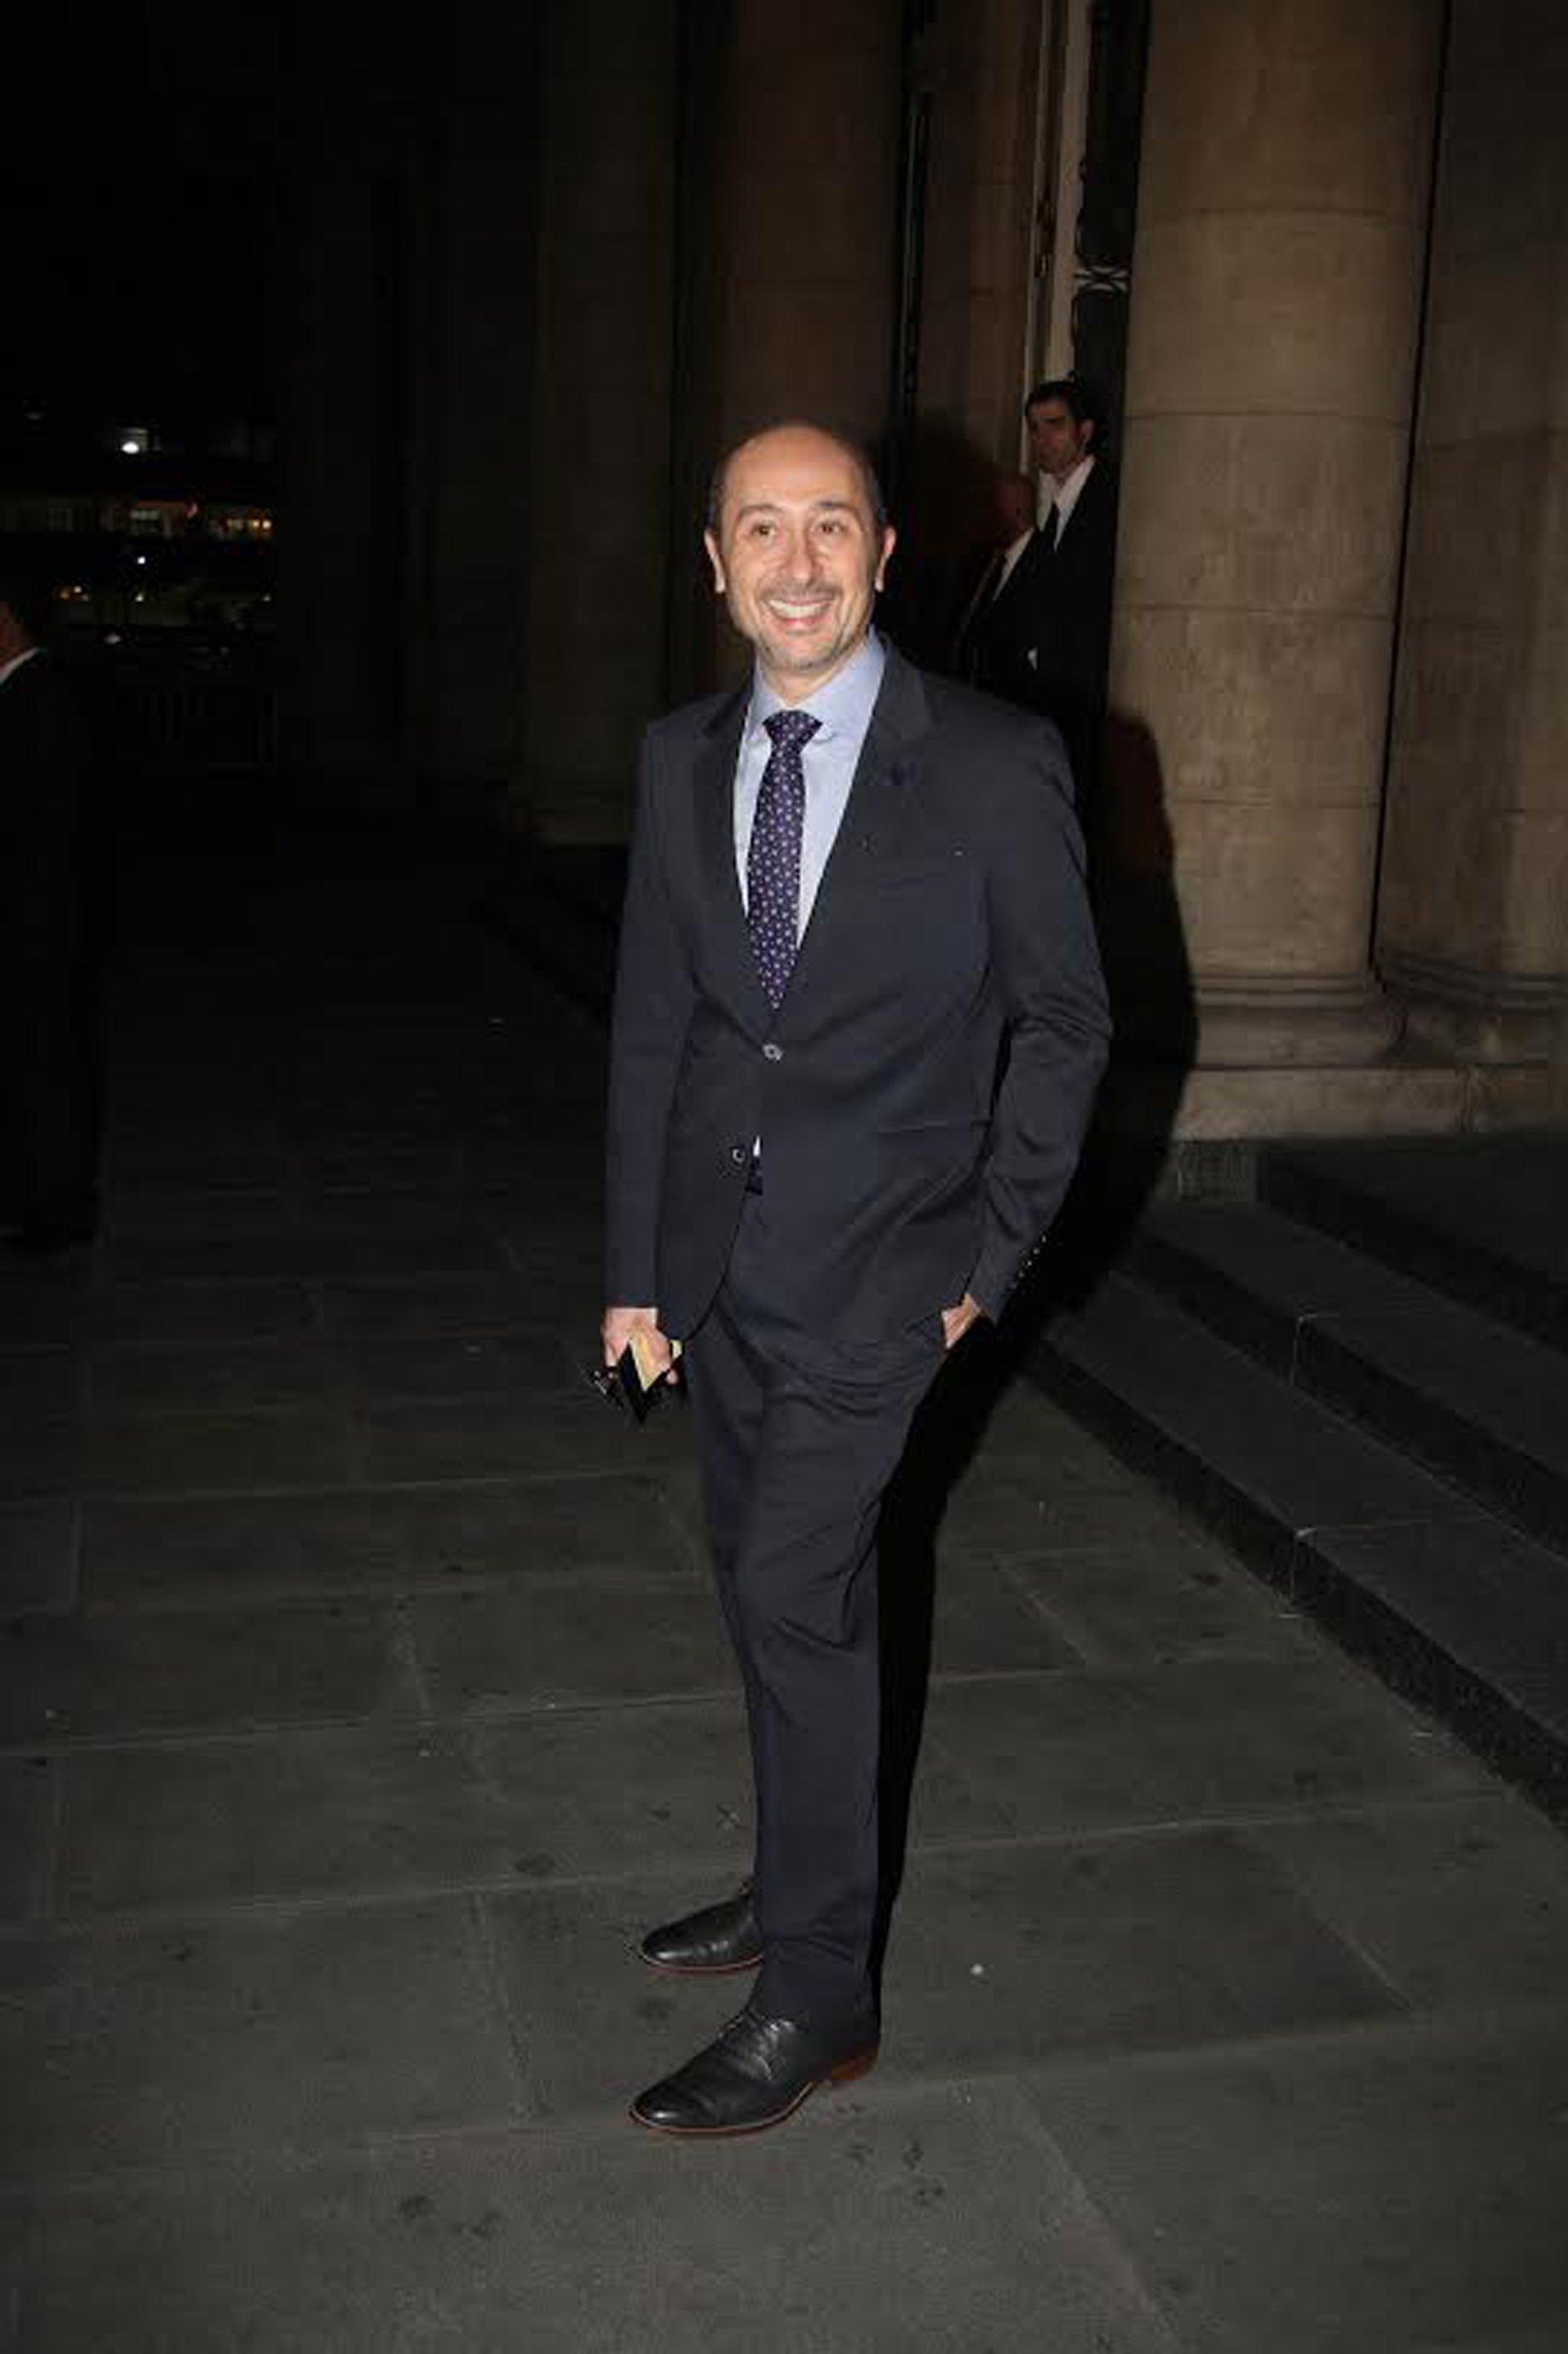 Claudio Cosano